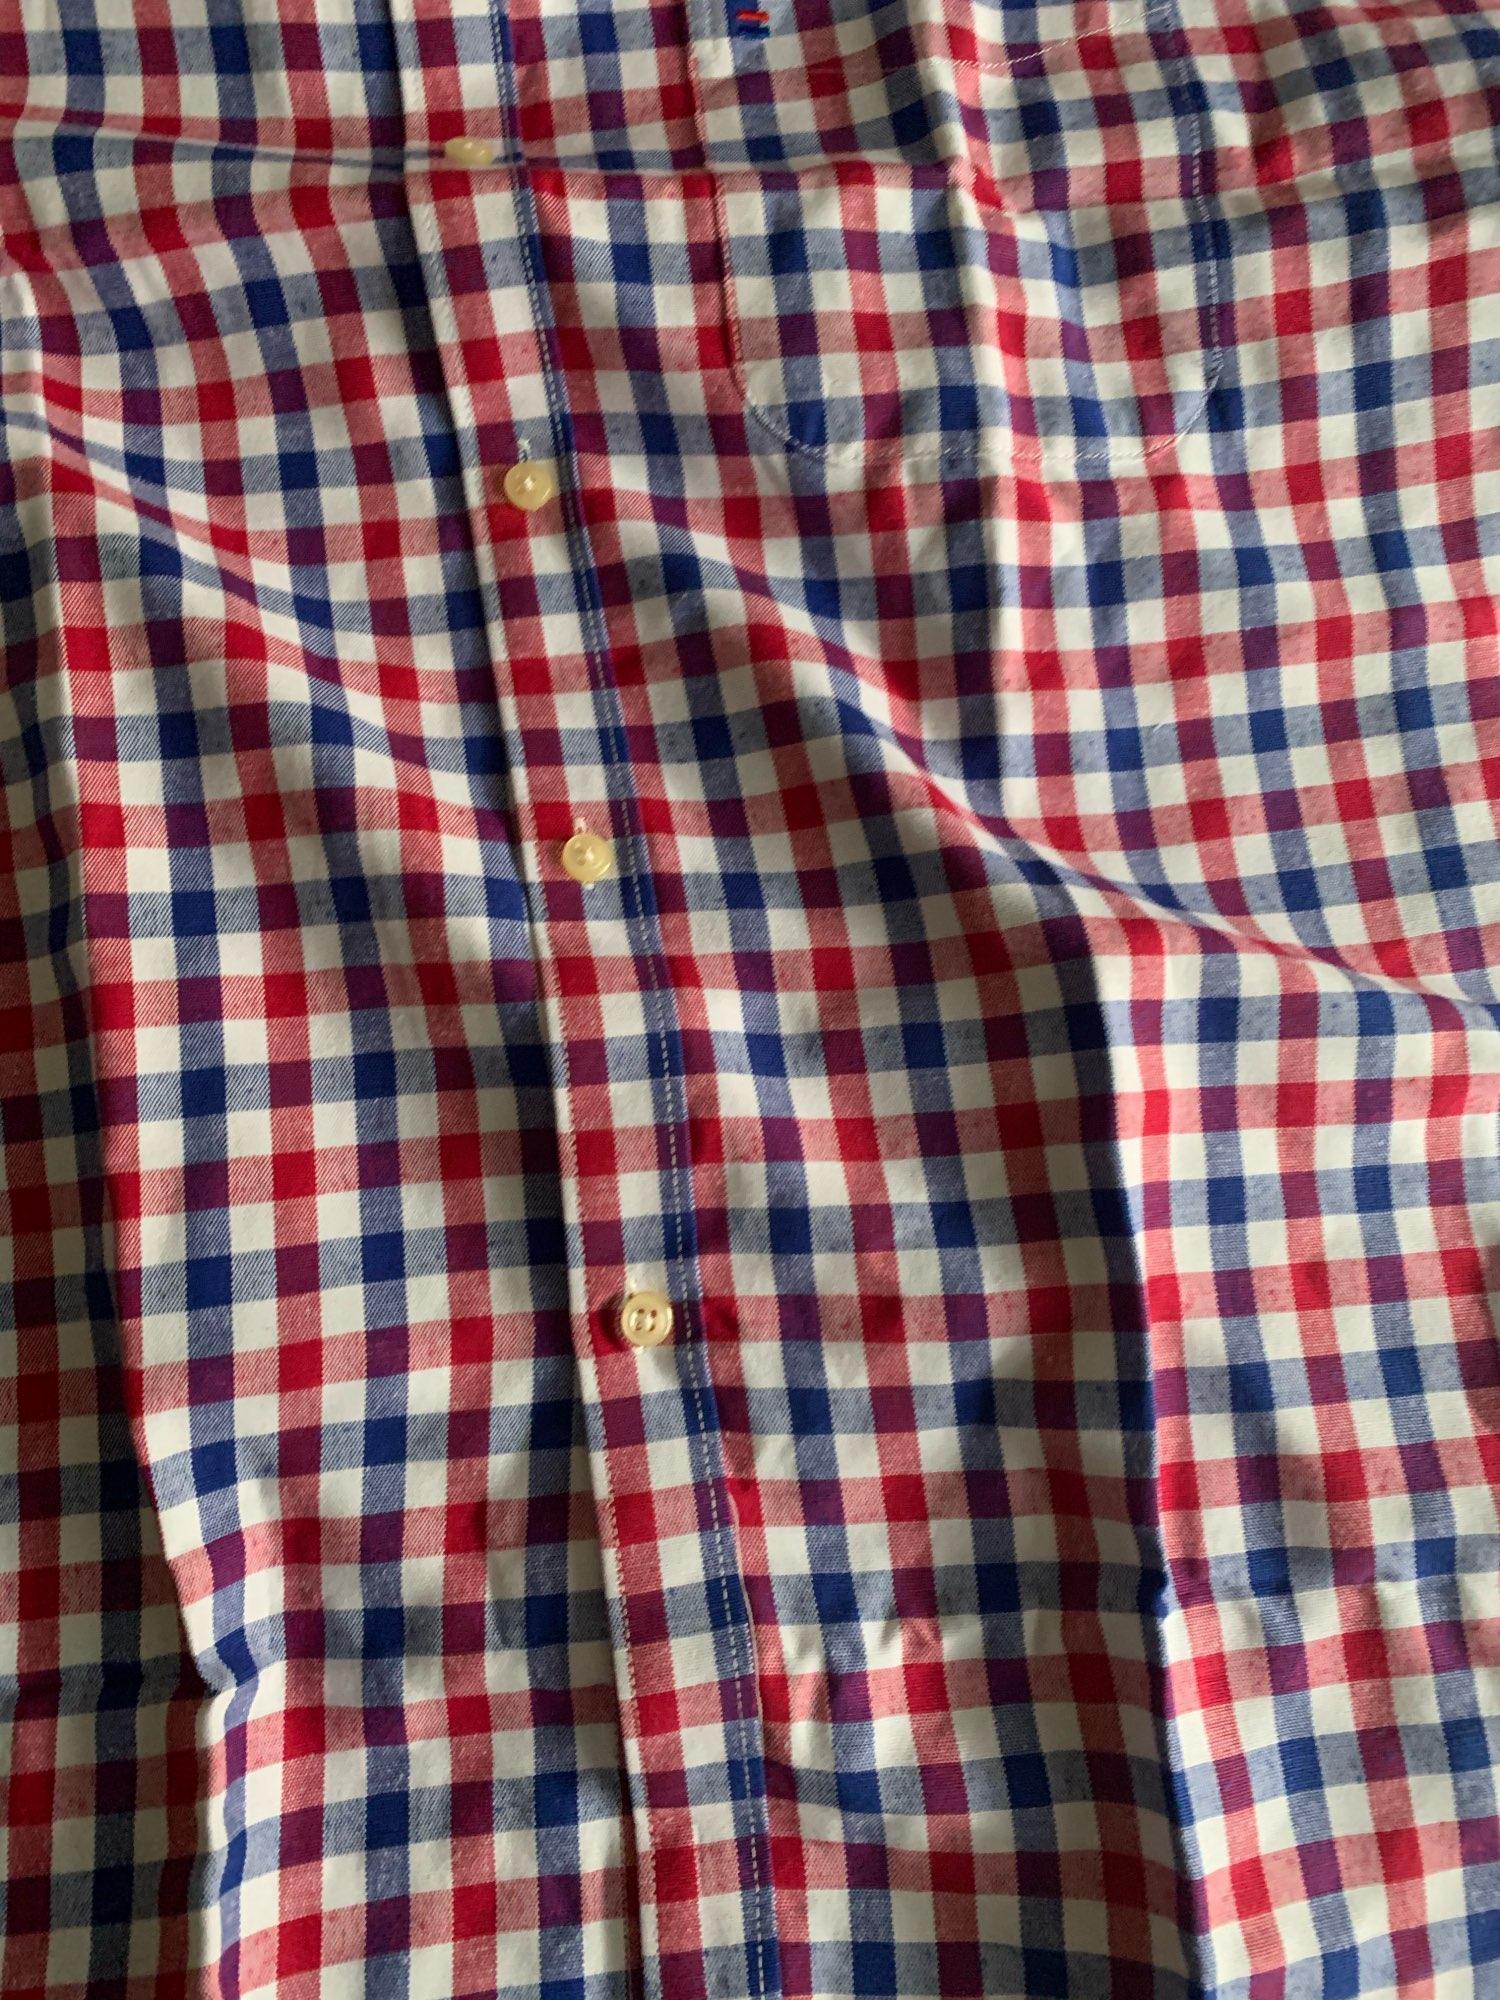 Men's Fashion Long Sleeve Plaid Striped Oxford Shirt Single Pocket Standard fit Button down Checkered Outerwear Casual Shirts oxford dress shirt dress shirtstriped dress shirt - AliExpress